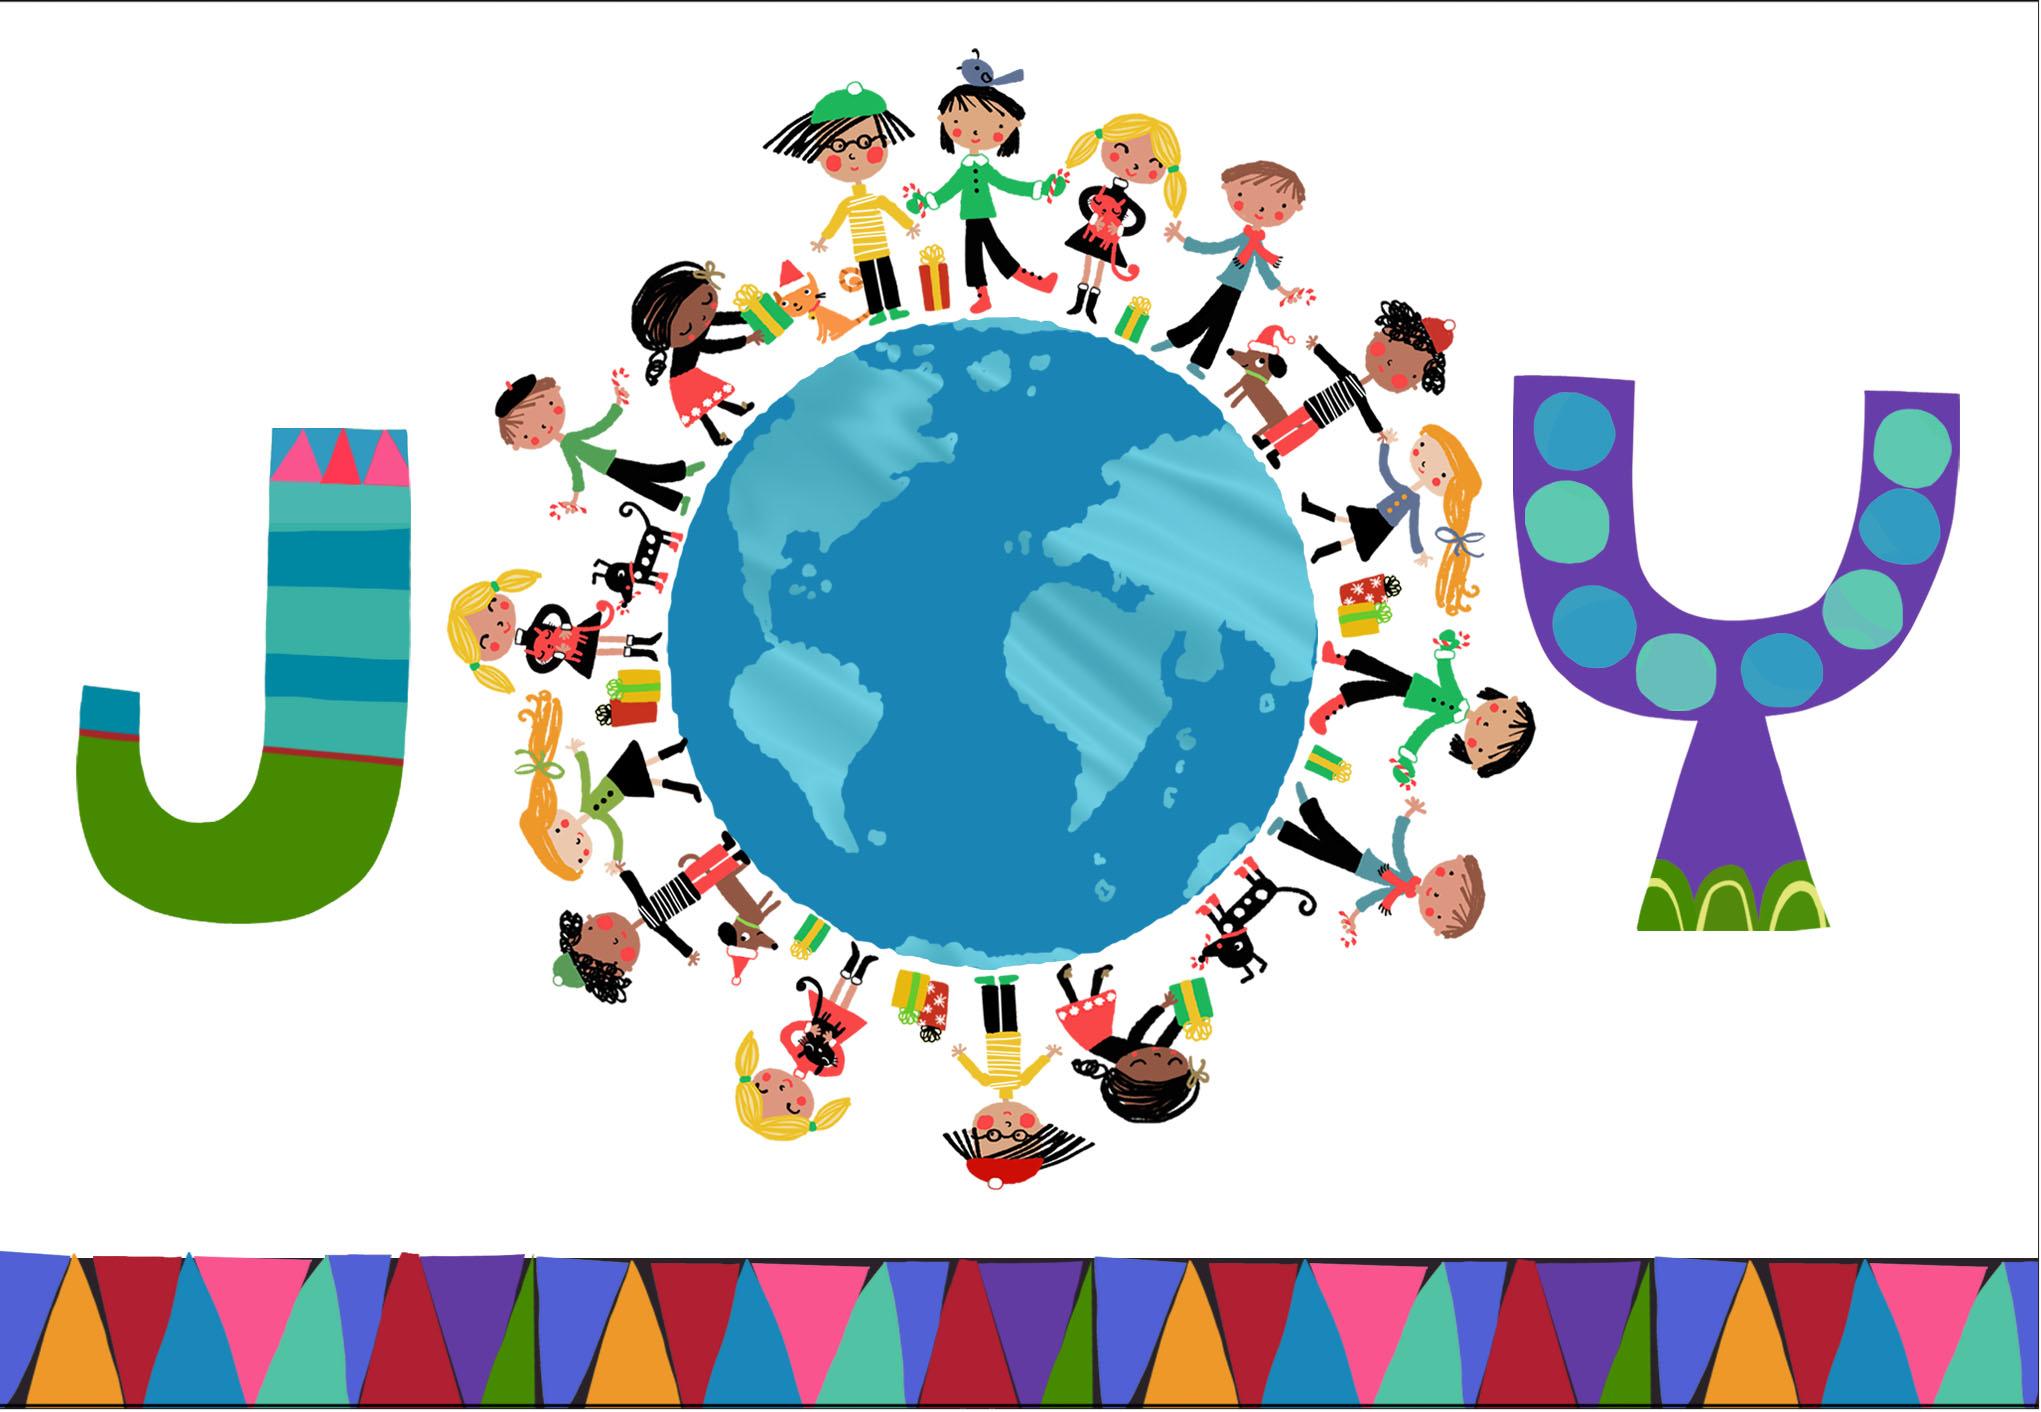 Unicef Christmas Cards 2020 Unicef Christmas Cards 2020 Canada | Czpkdy.vipnewyear.site